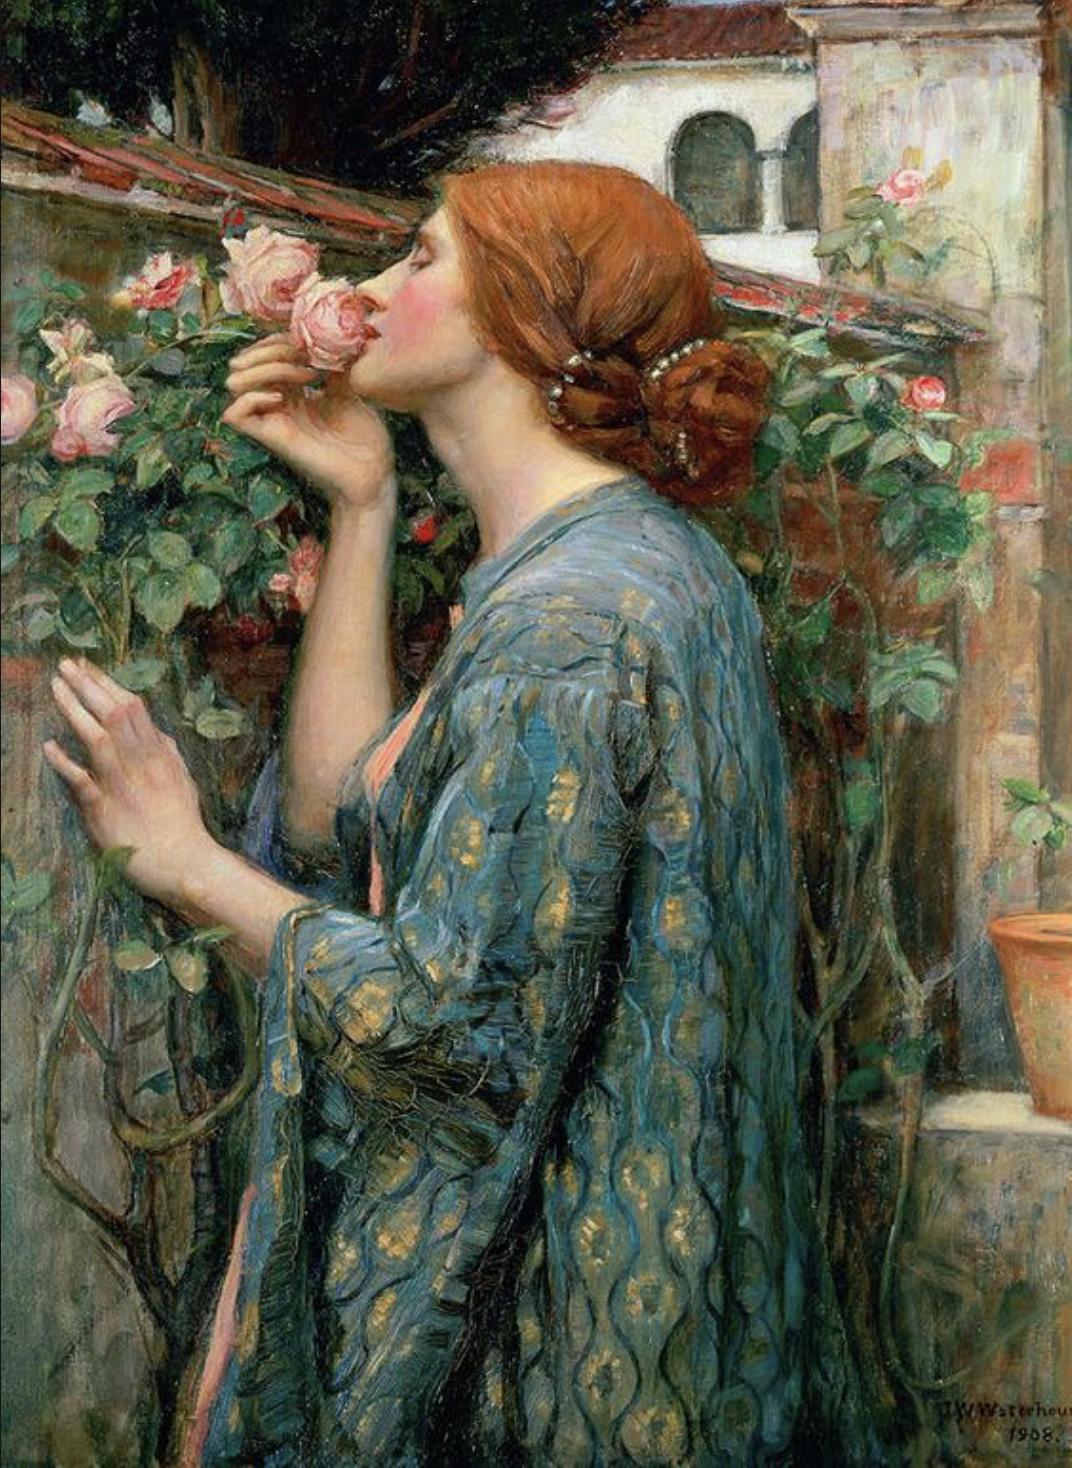 John William Waterhouse, 1849-1917.